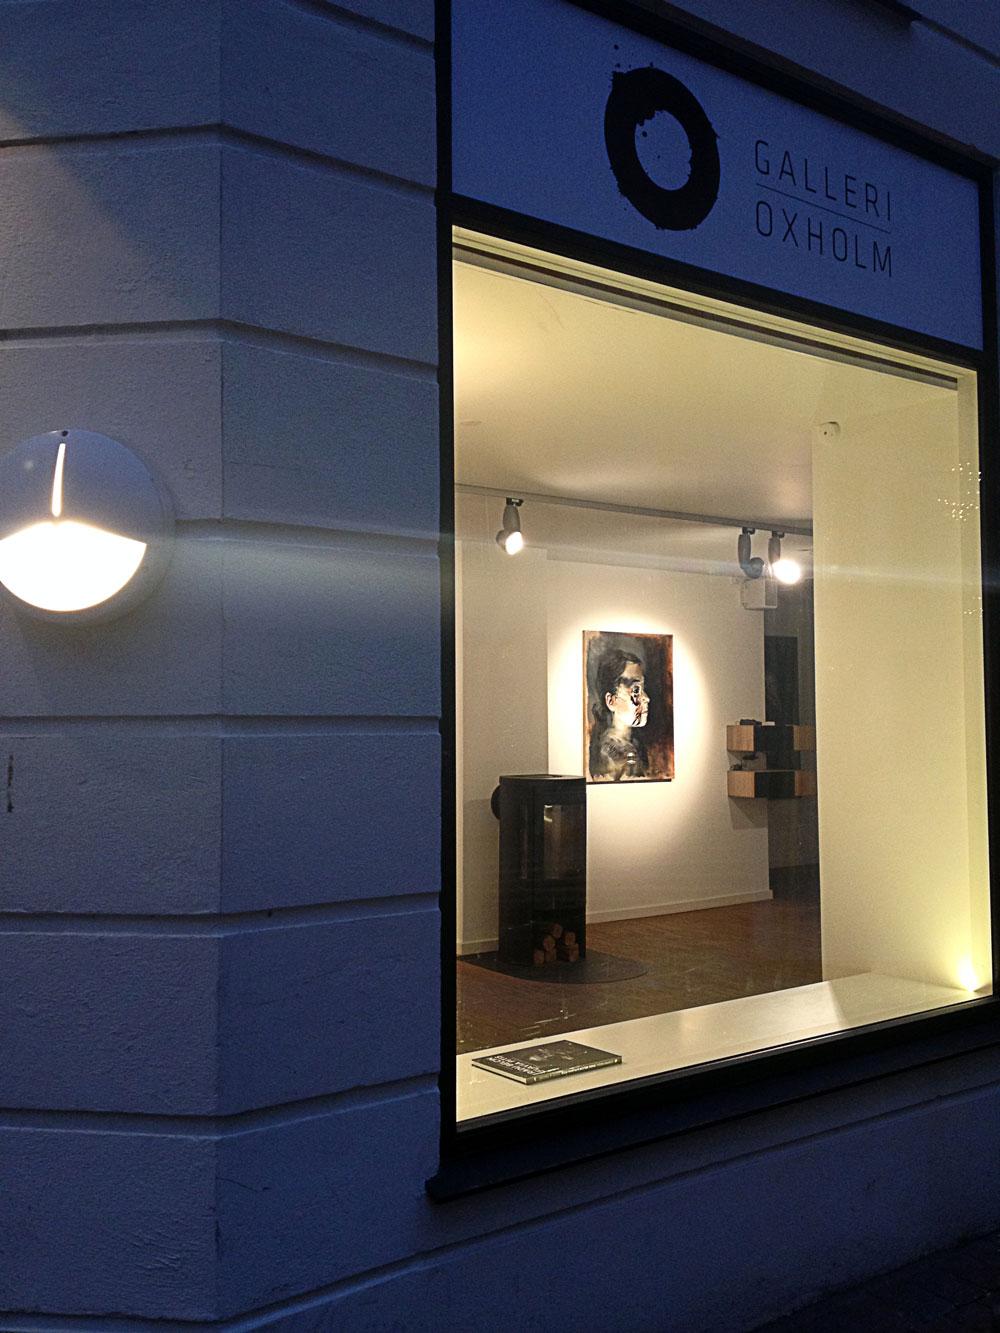 Flavia Pitis, Landscape over time @ Oxholm Gallery, Copenhagen (2)